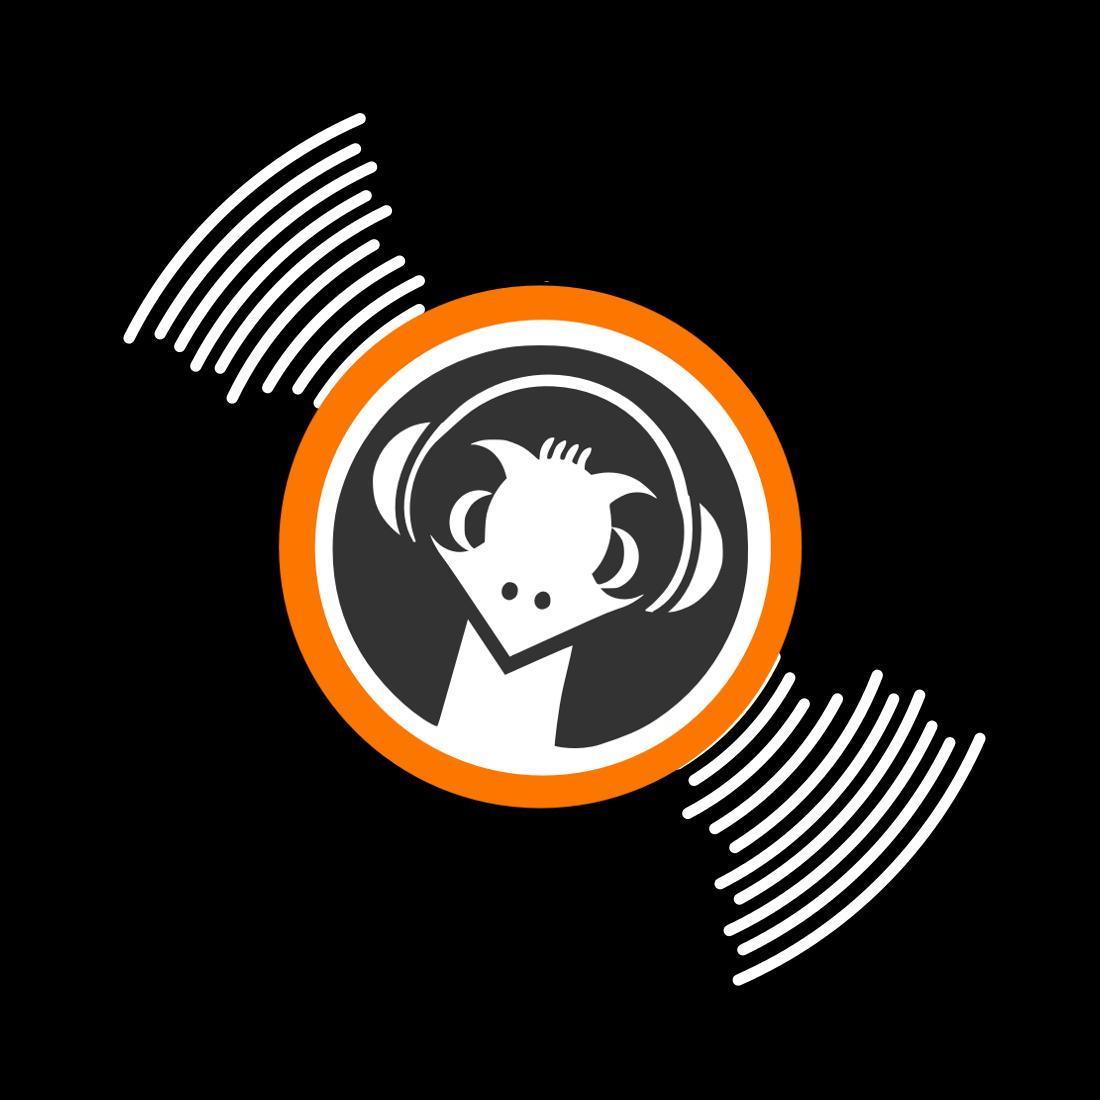 [Die Intellektronische Biparietal Projekt] Catalogue Automne-Hiver v1.0